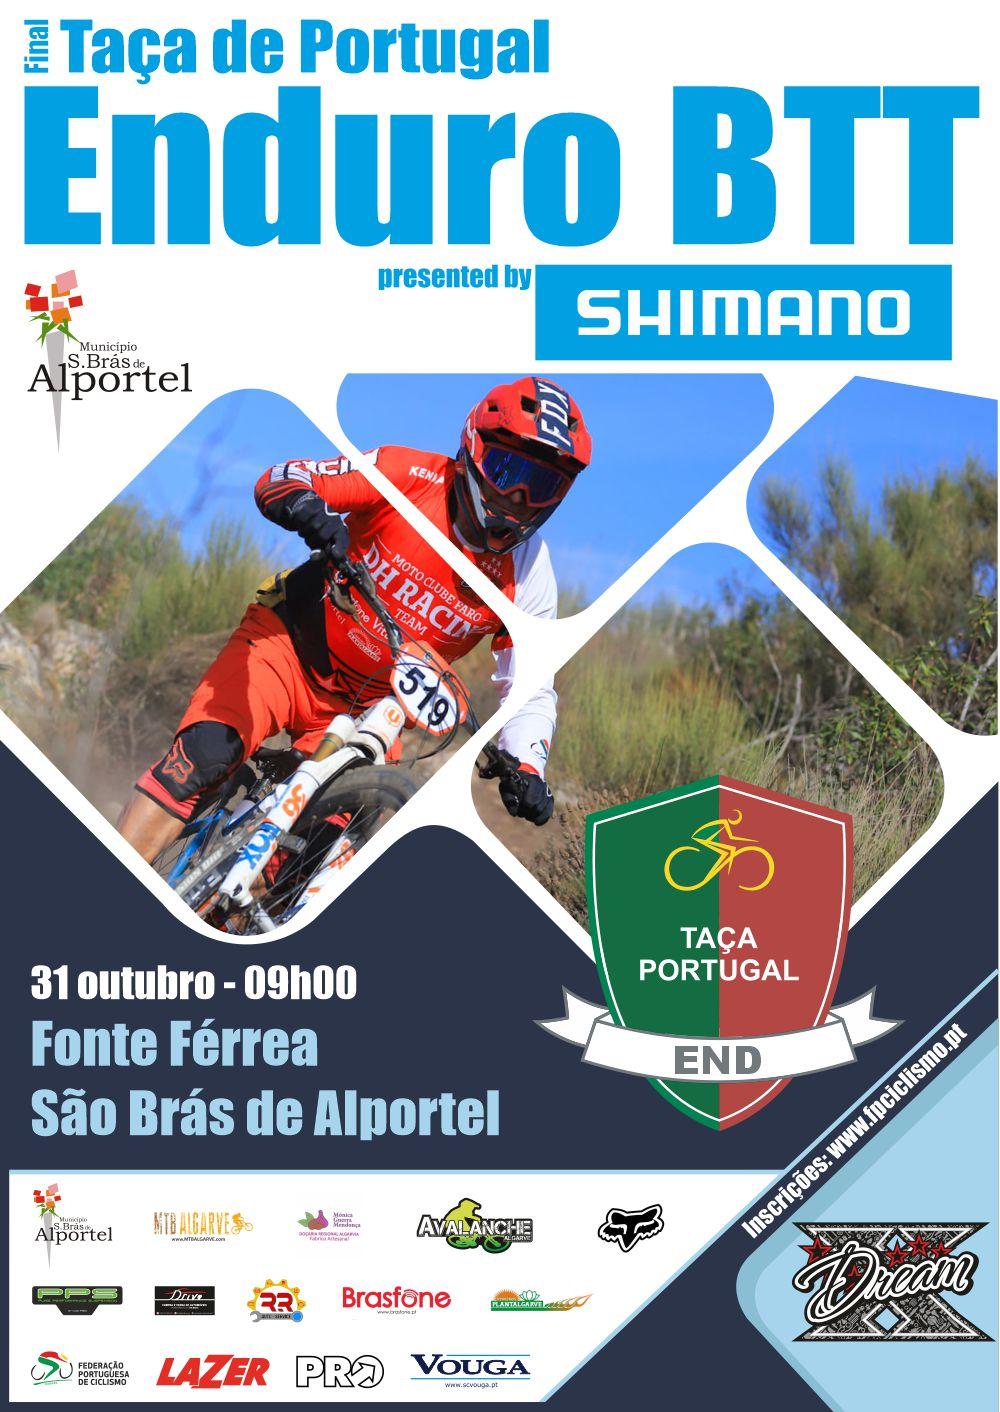 4ª Taça de Portugal Enduro presented by Shimano